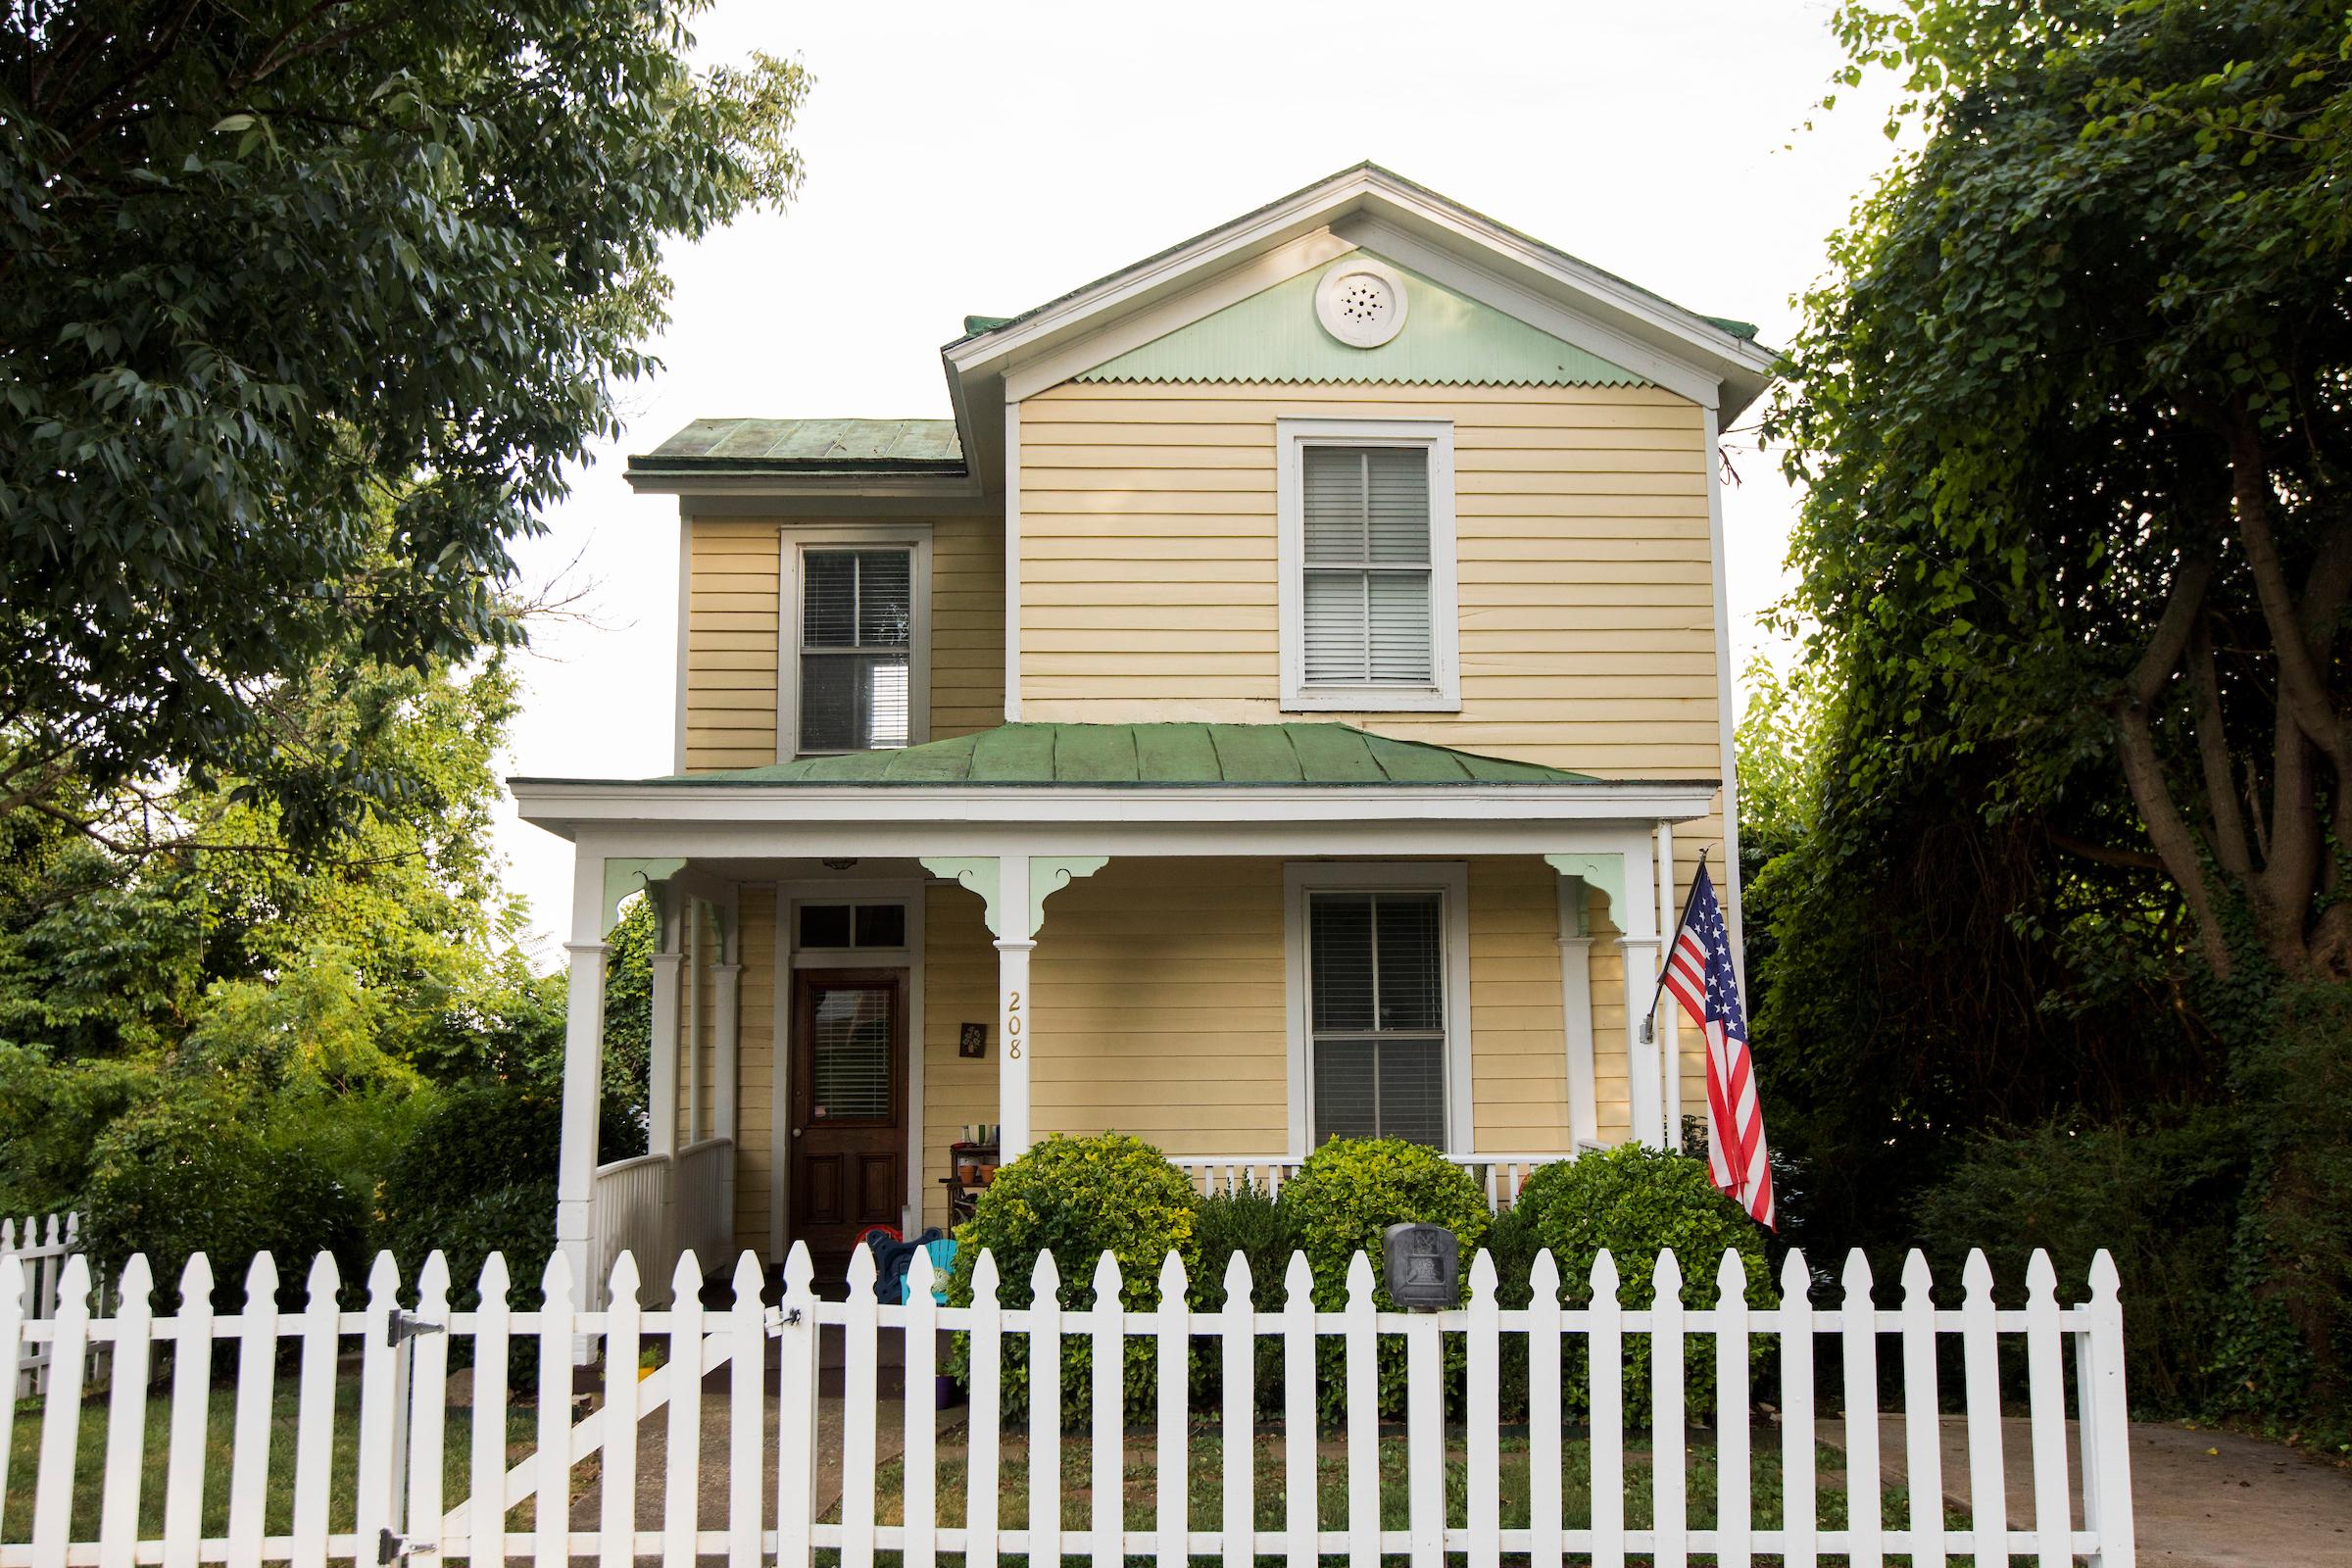 Waugh house 208 F St 001.jpg